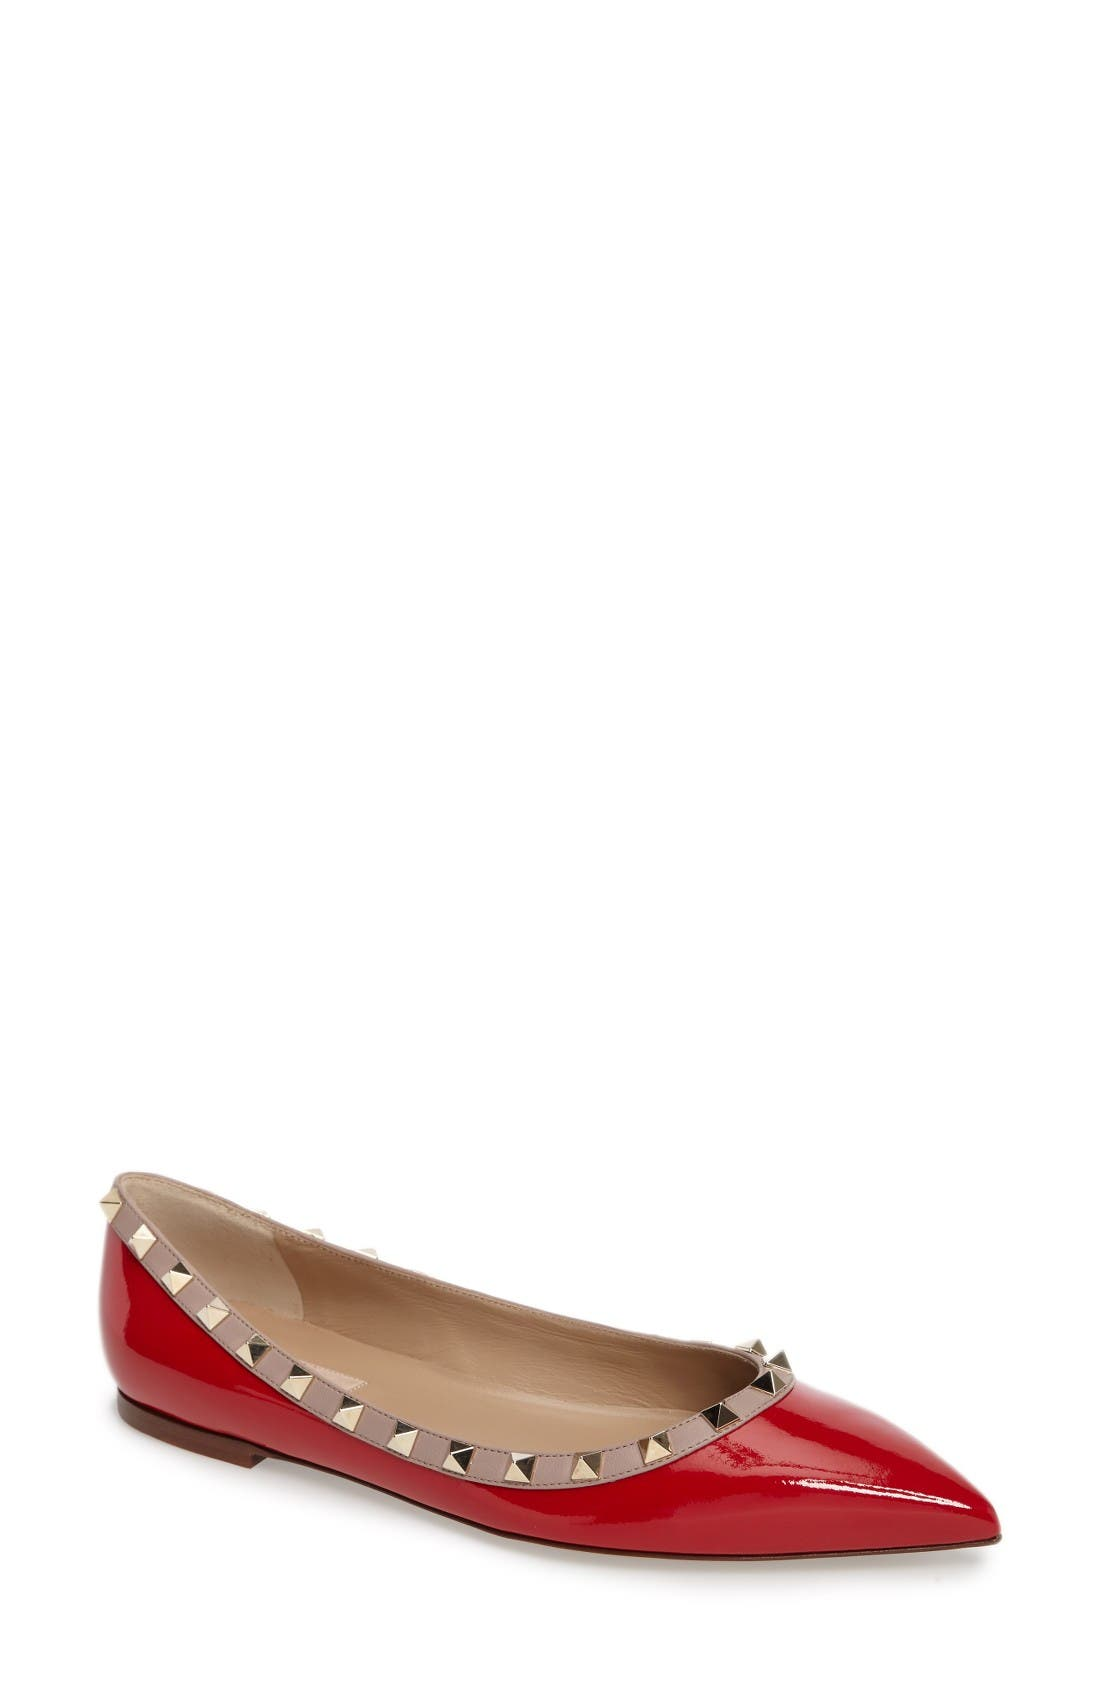 c901cb2252b5 Valentino Women s Shoes